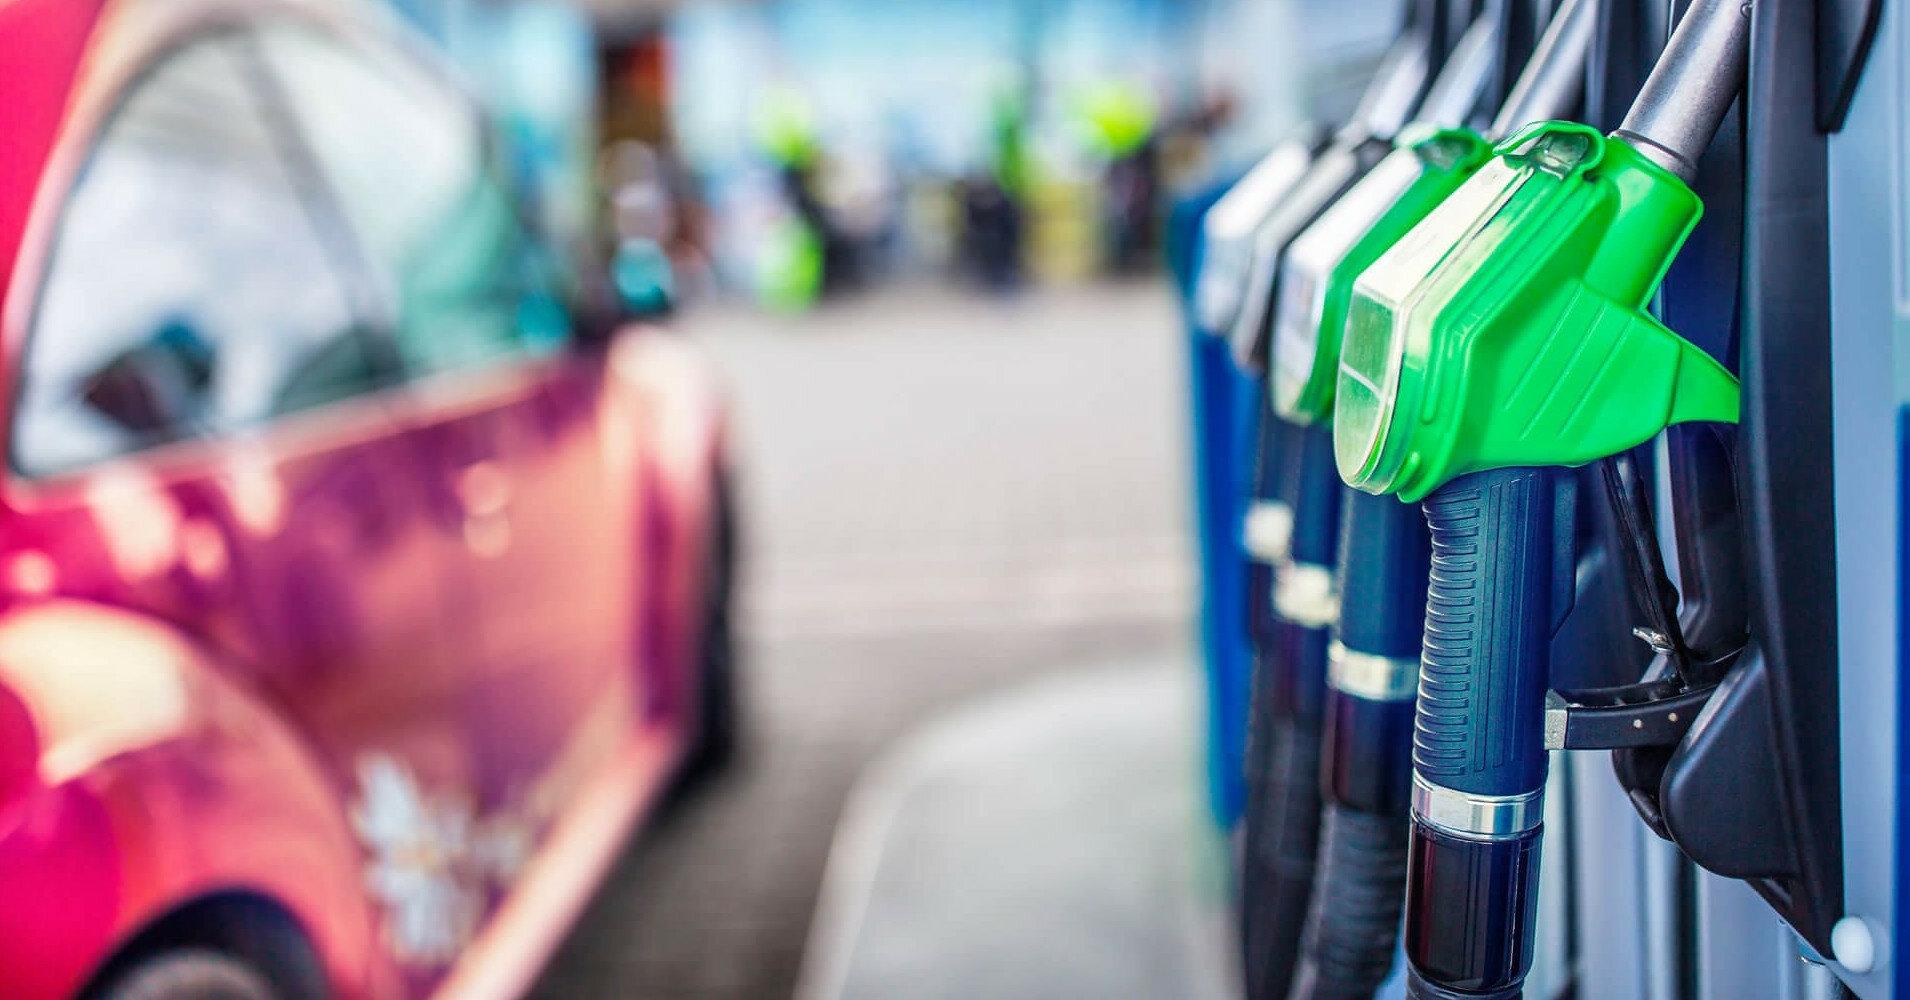 Socar утроится за счет Glusco: последствия сделки для рынка